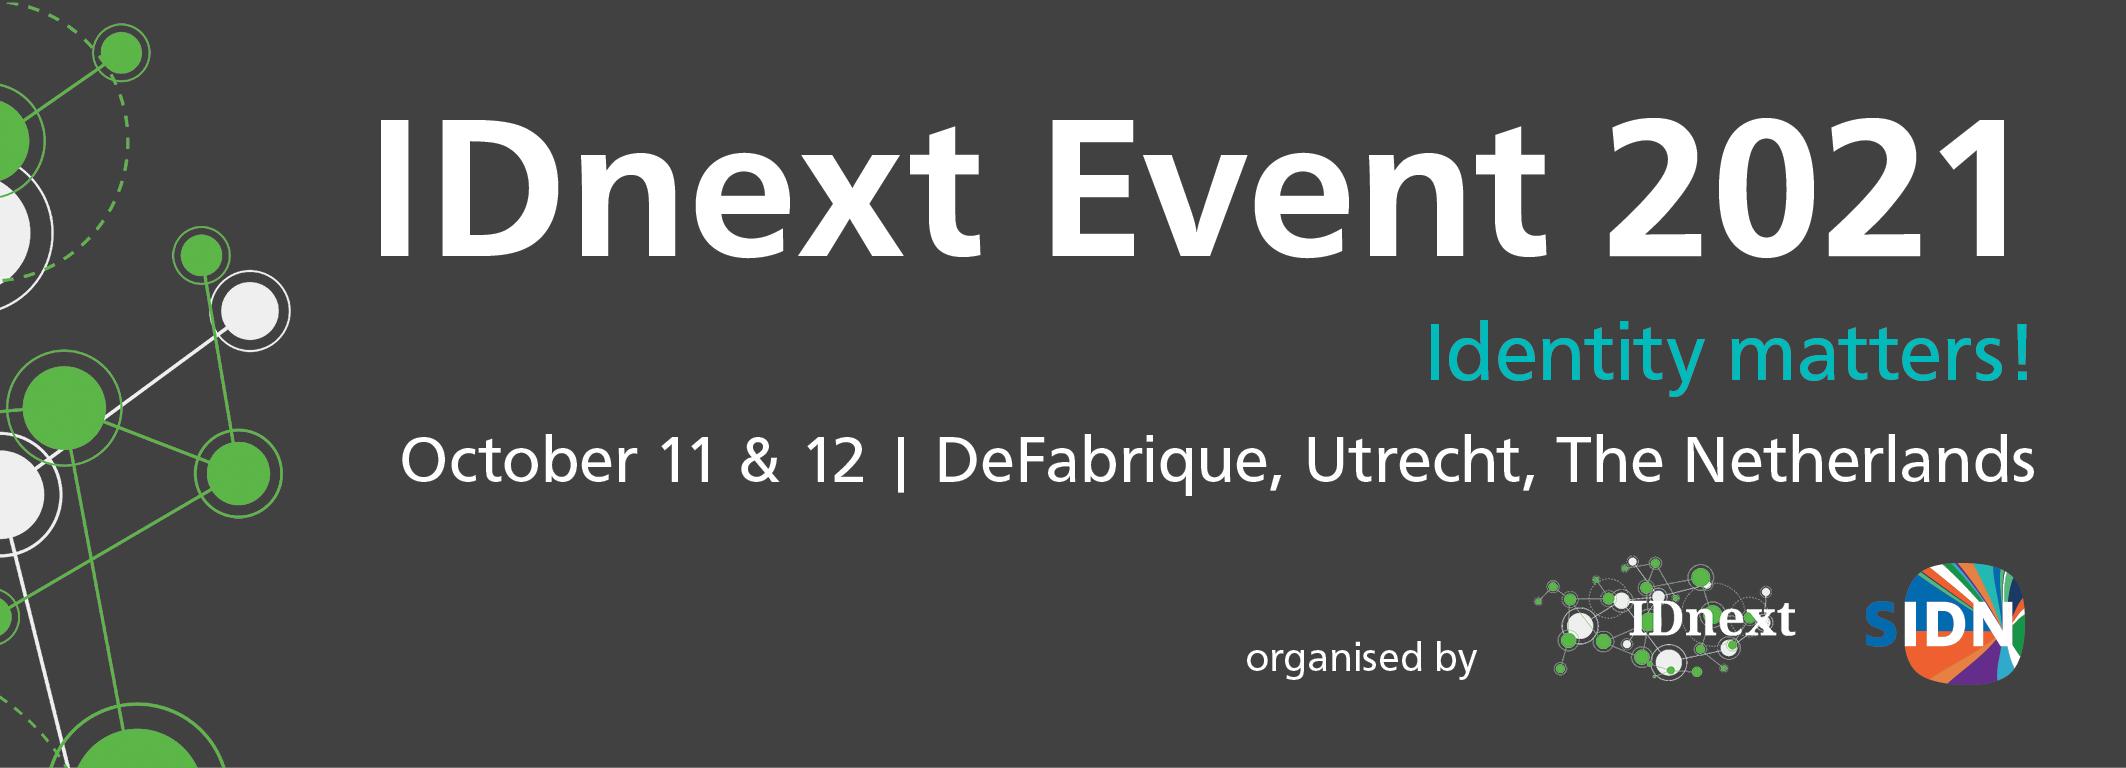 IDnext '21 : Annual IDnext program – IDnext